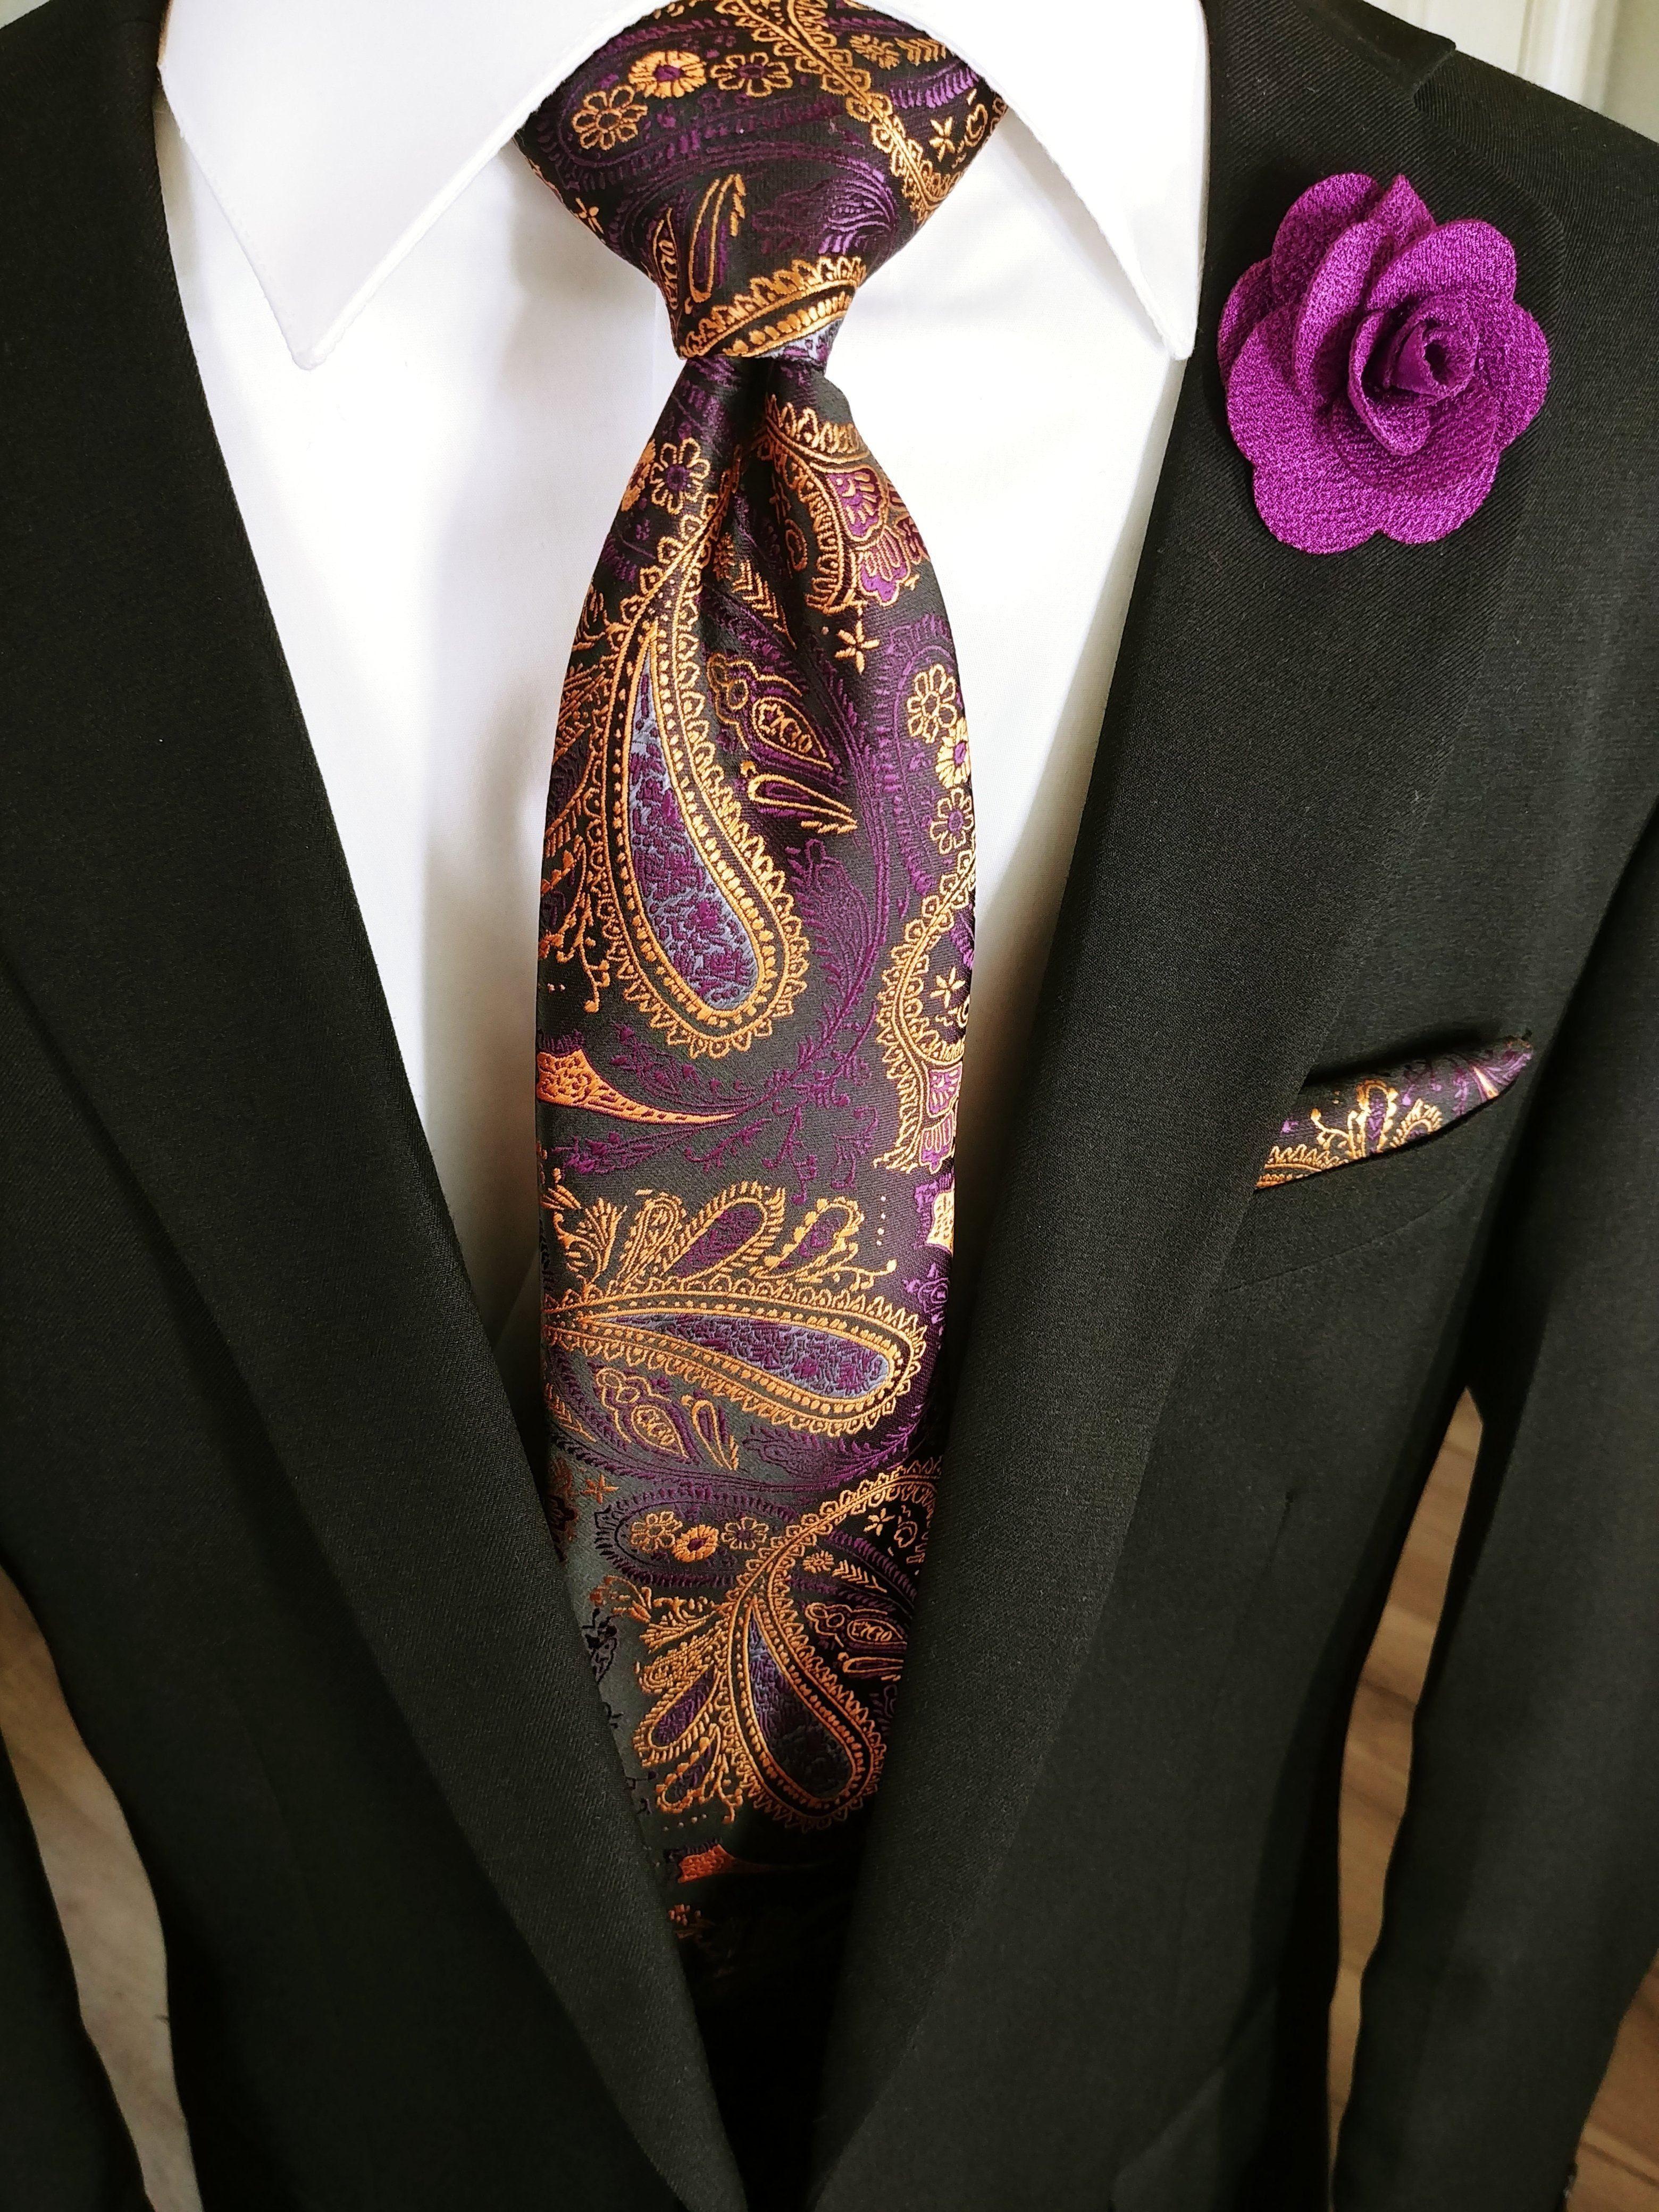 b5eb73336ace Purple Silk Paisley Tie Pocket Square Cufflinks Set Black & Light Brown